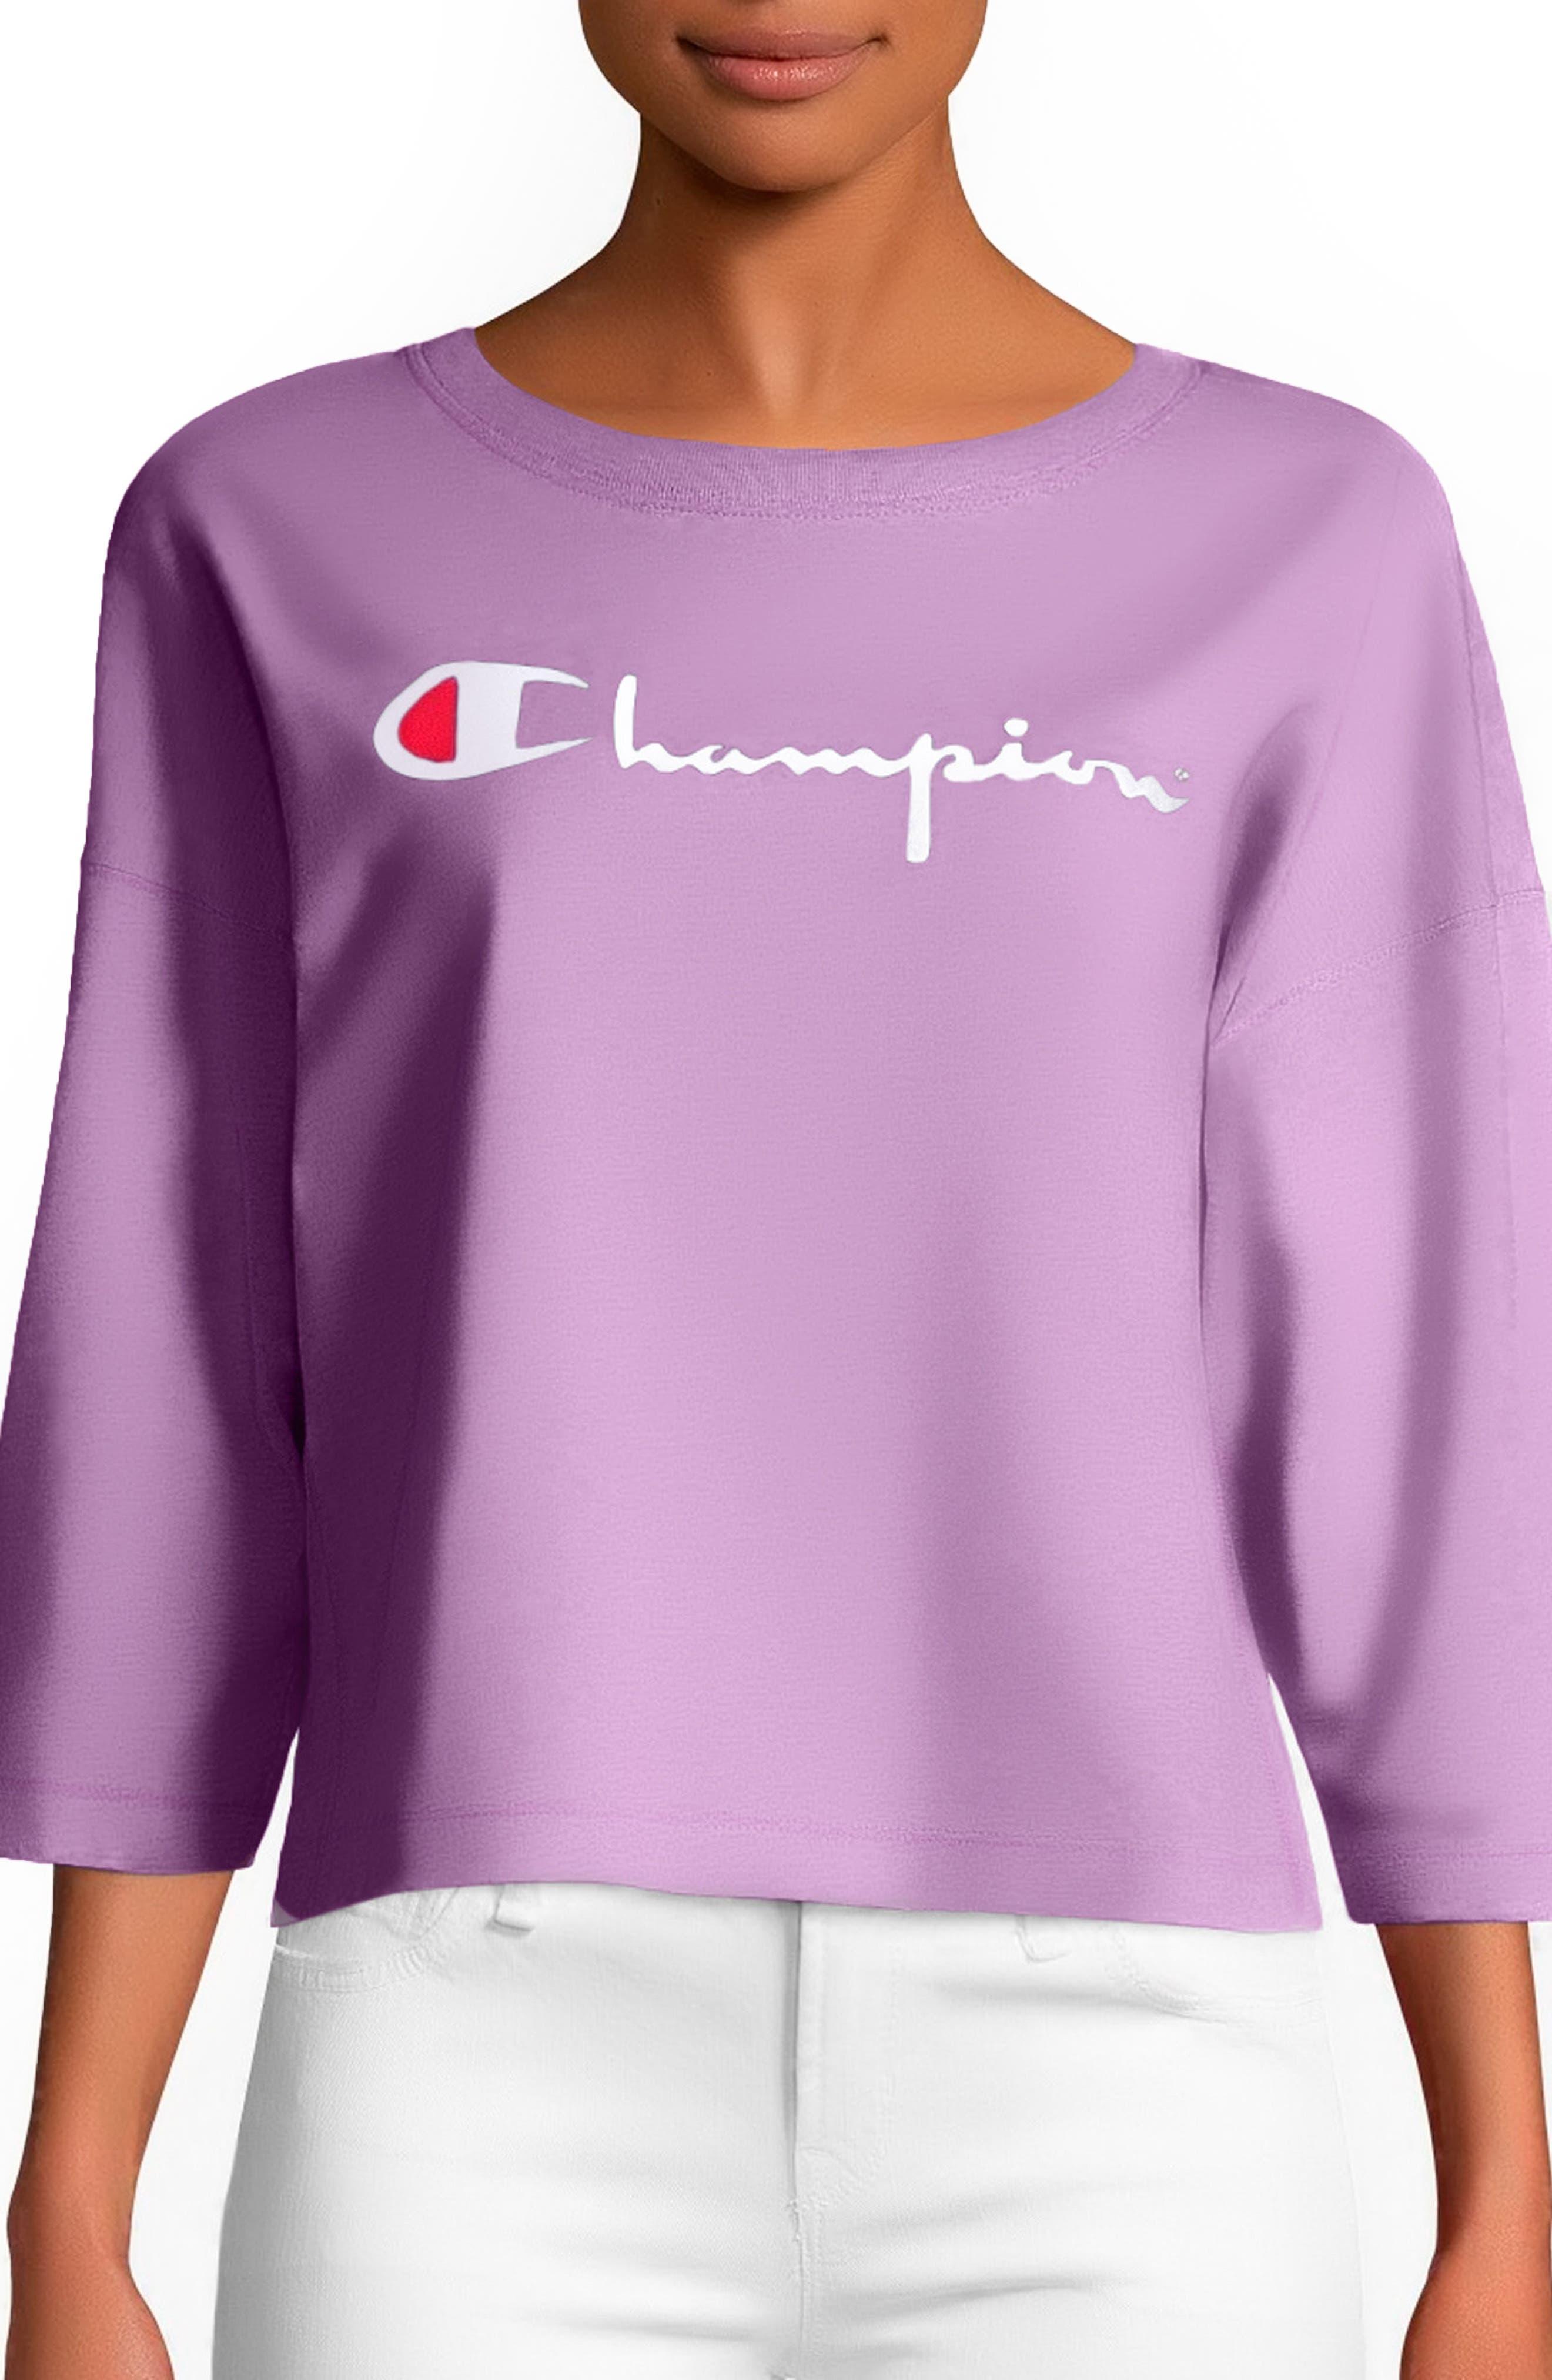 Logo Crop Tee,                             Main thumbnail 1, color,                             Pink